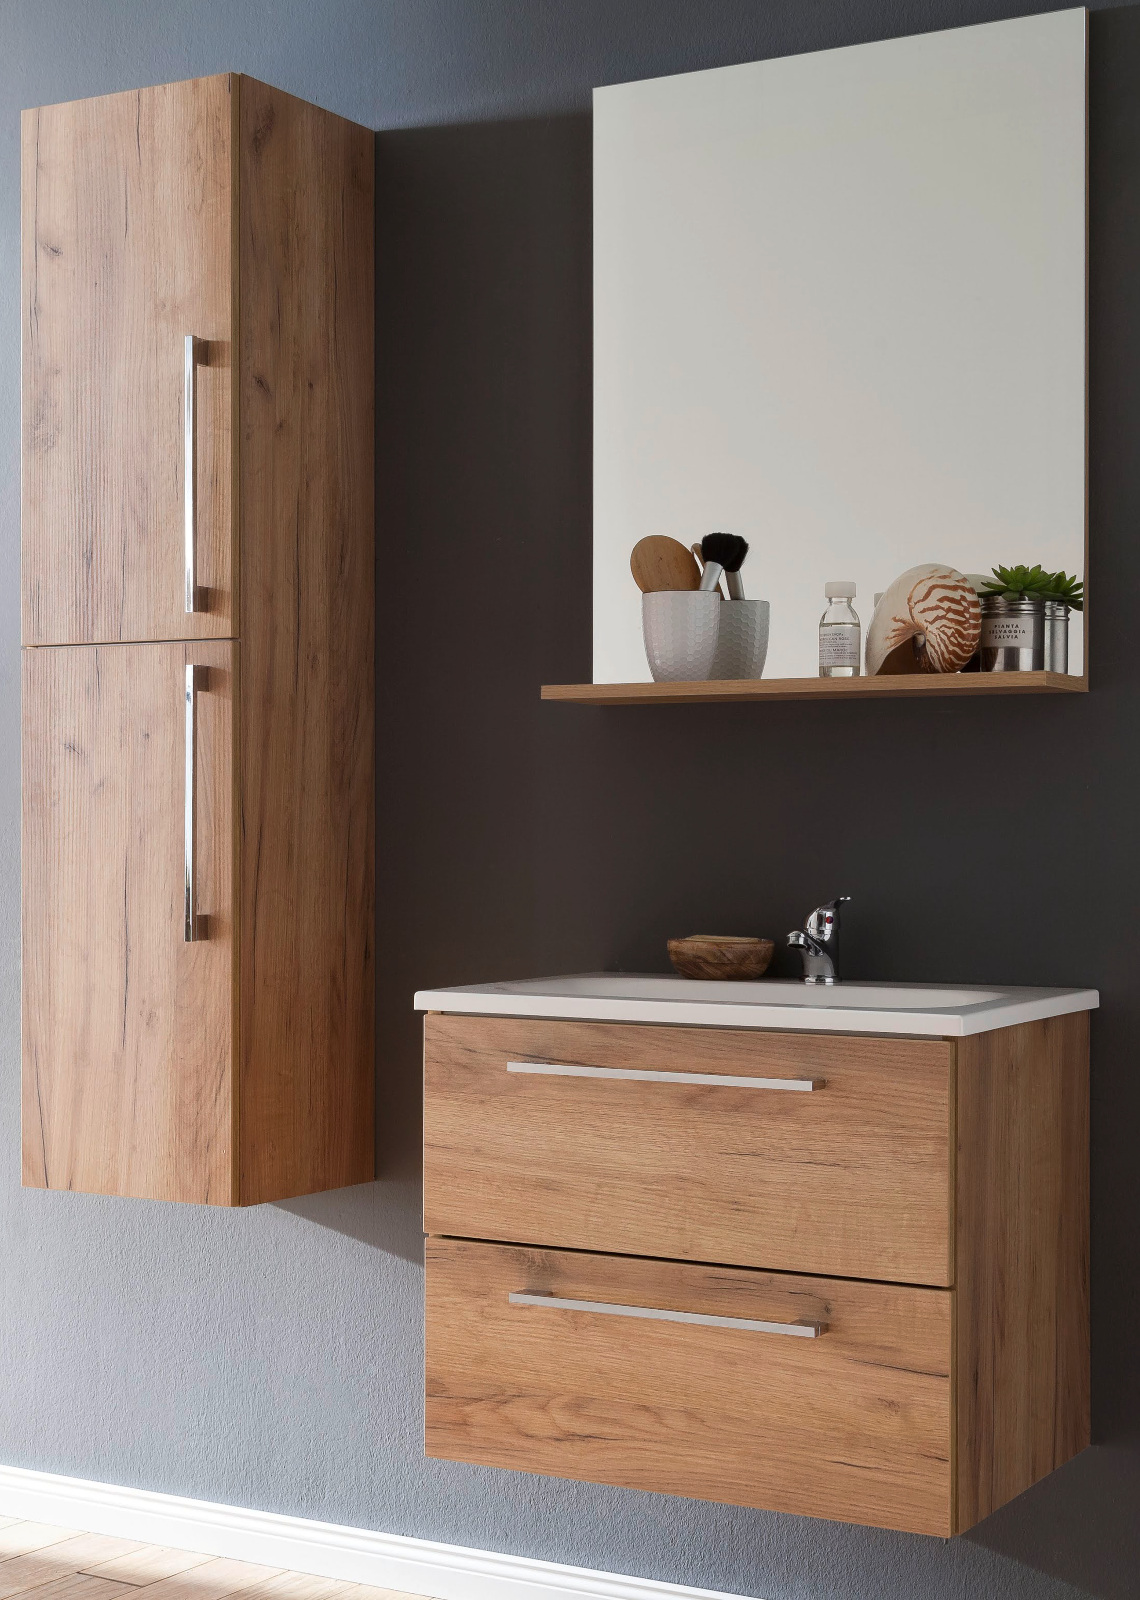 bad h ngeschrank intenso eiche tr ffel 32x140 cm. Black Bedroom Furniture Sets. Home Design Ideas